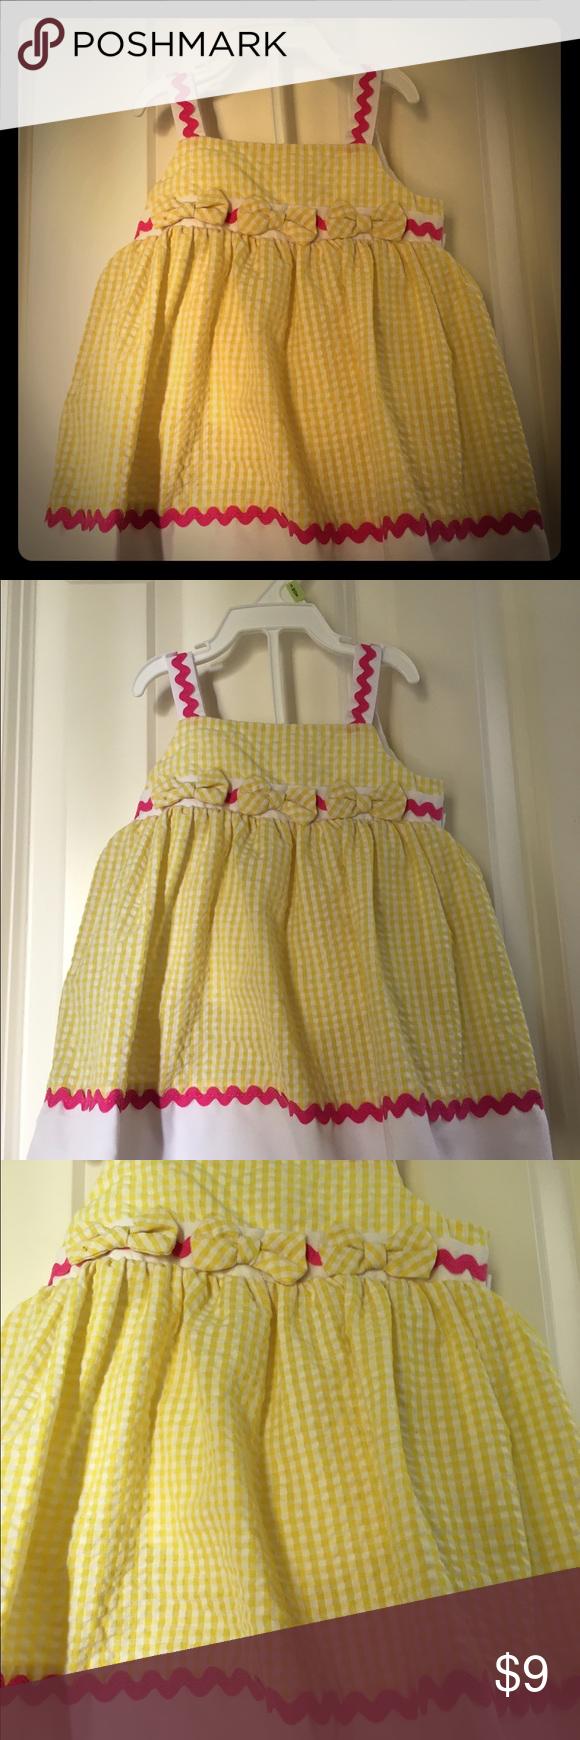 Yellow dress 3-6 months  Infant Yellow Seersucker Dress  My Posh Picks  Pinterest